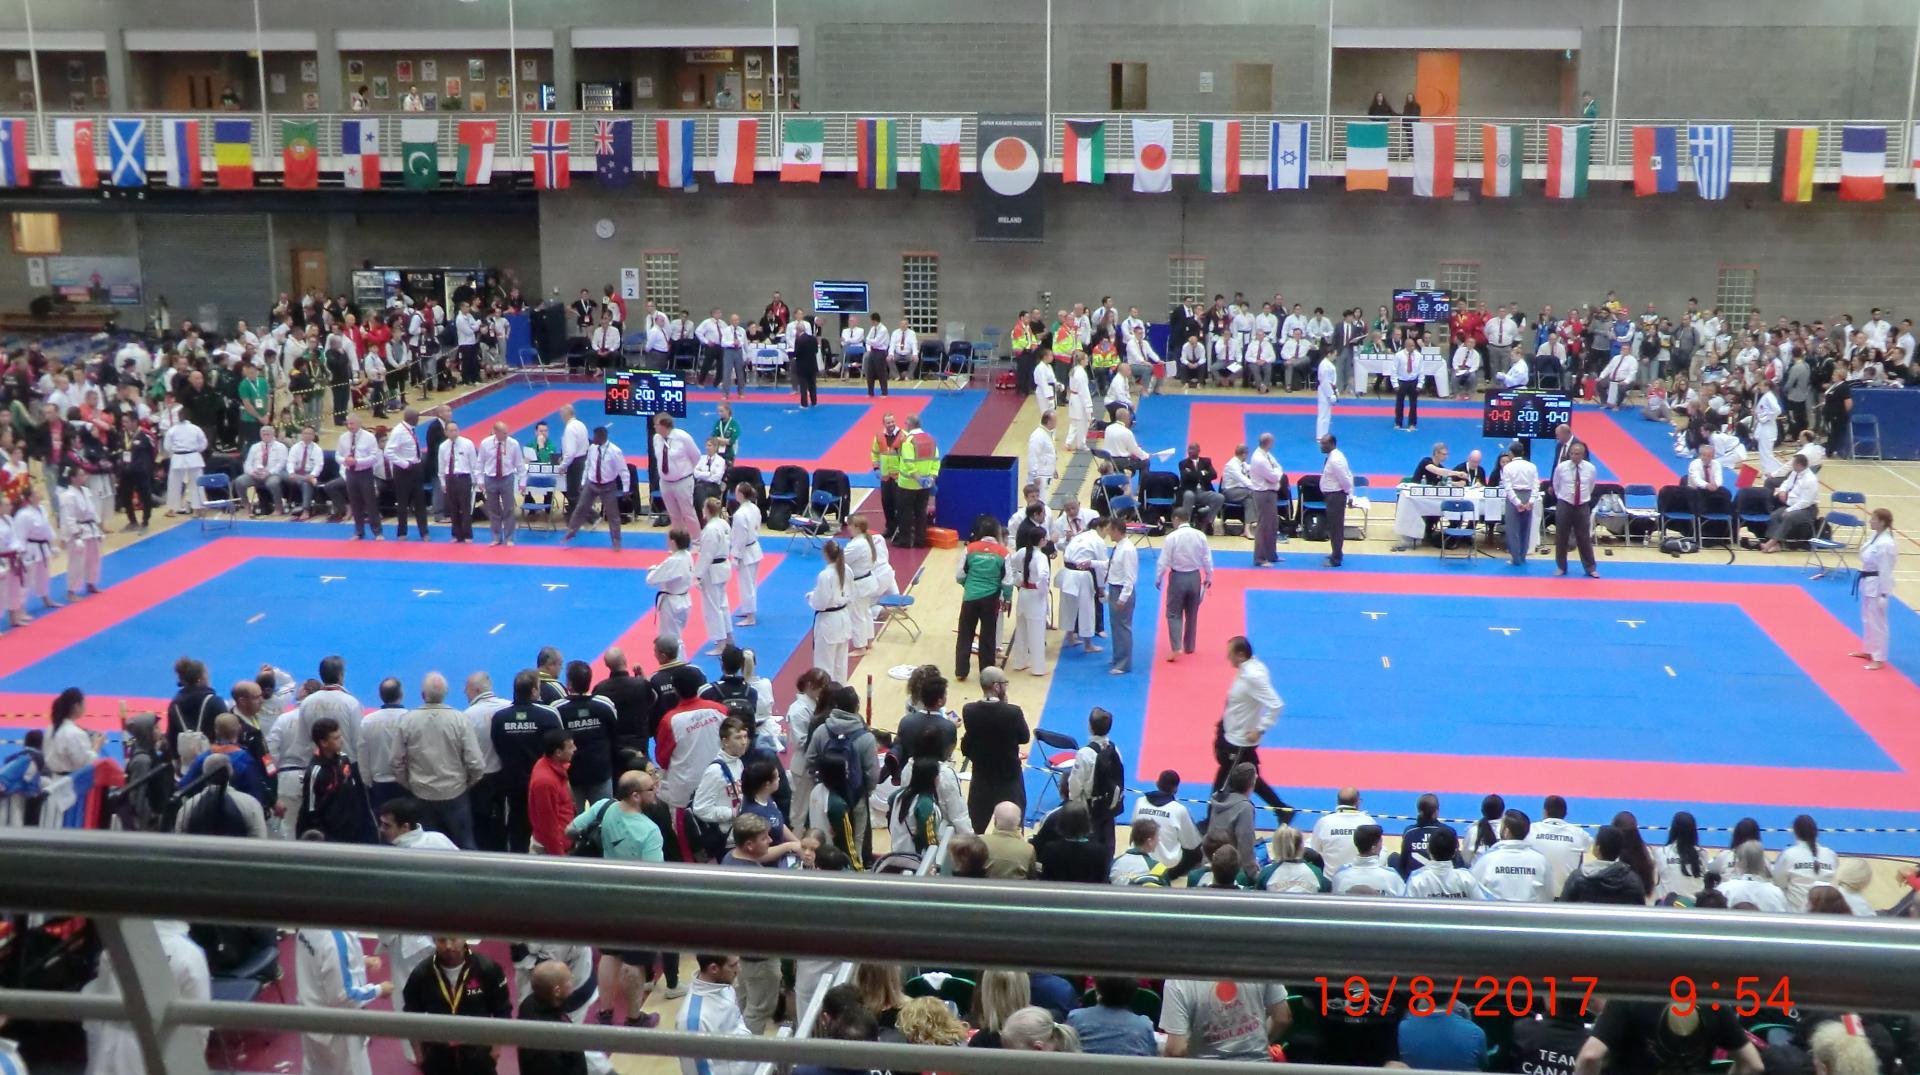 Championnat du Monde Jka 2017 à Limerick ( Irlande